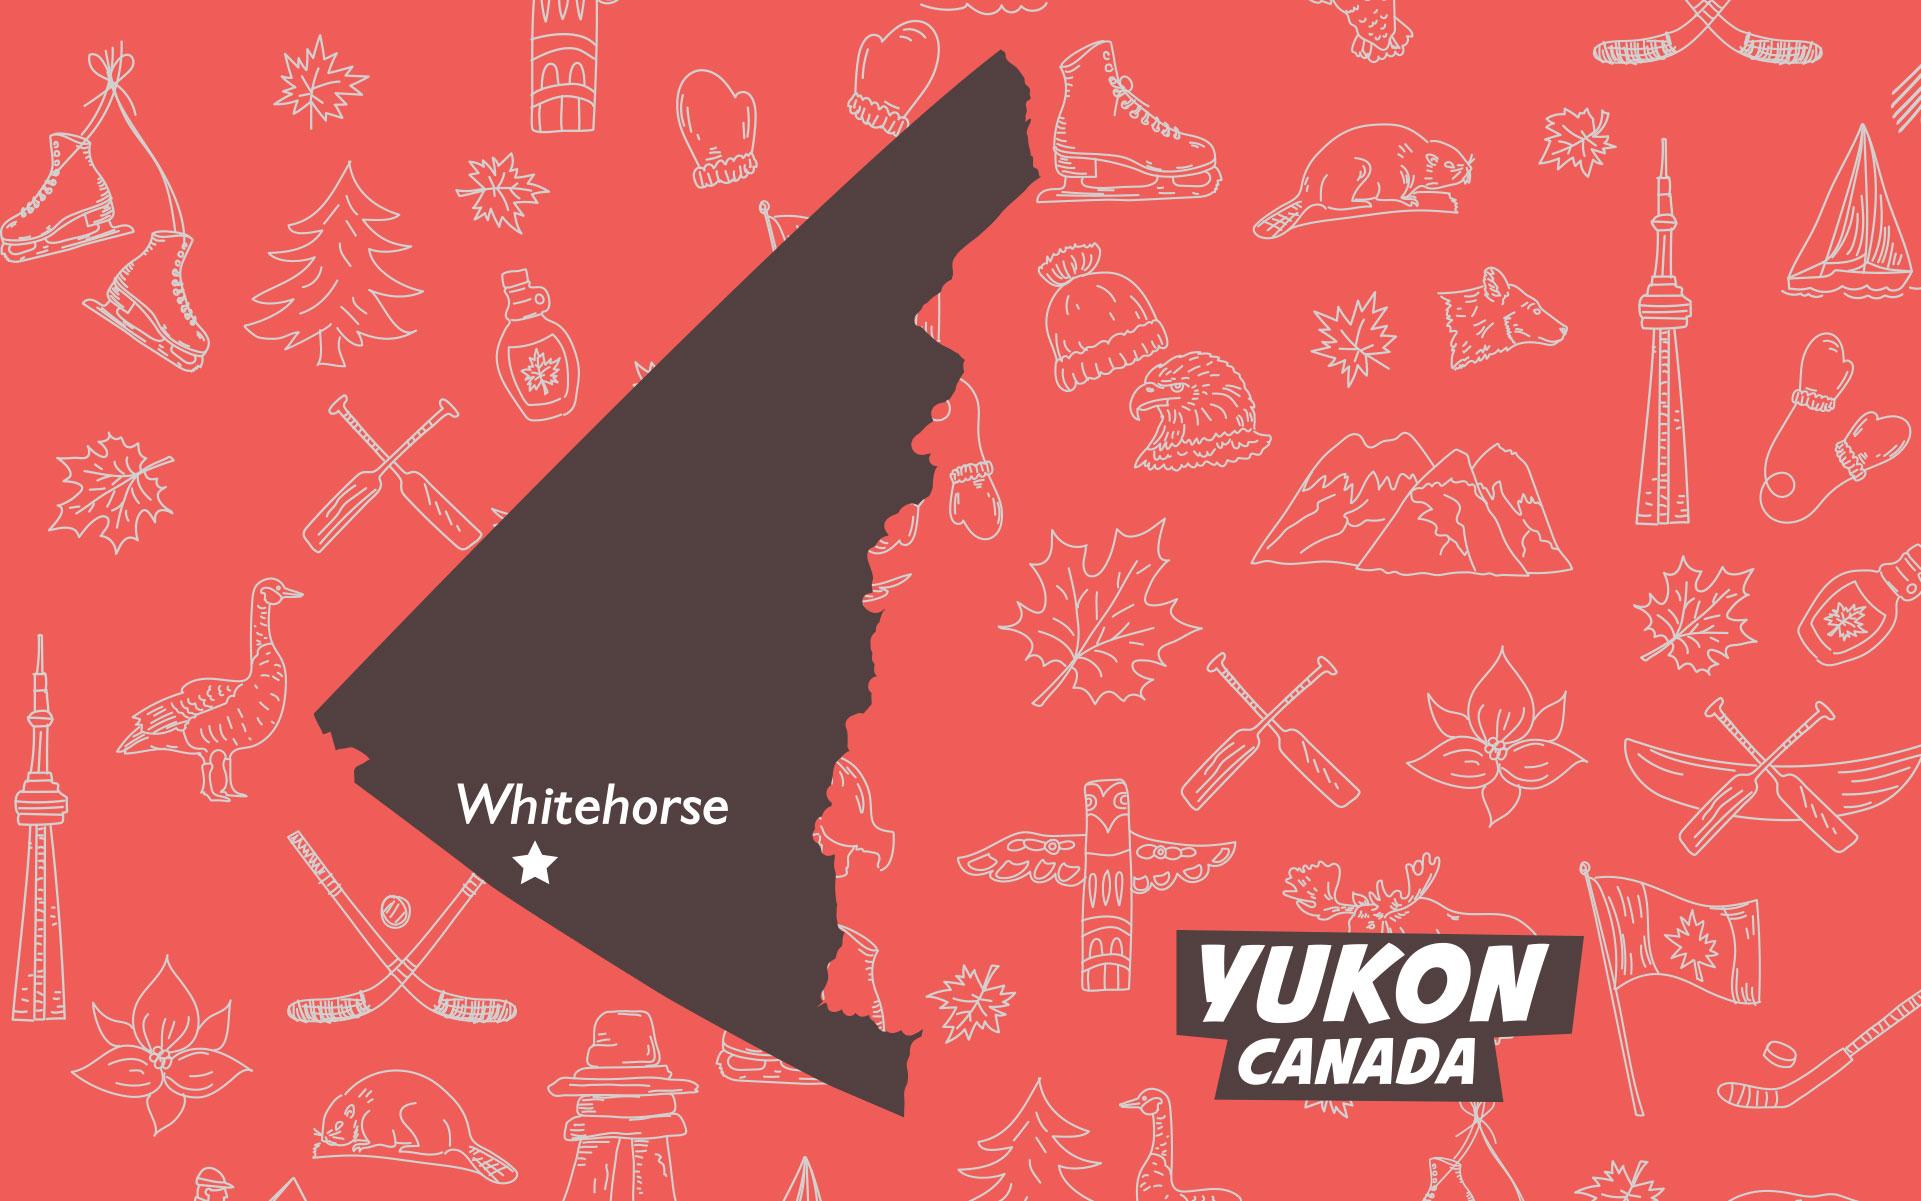 online dating whitehorses Yukon w4m dating leads